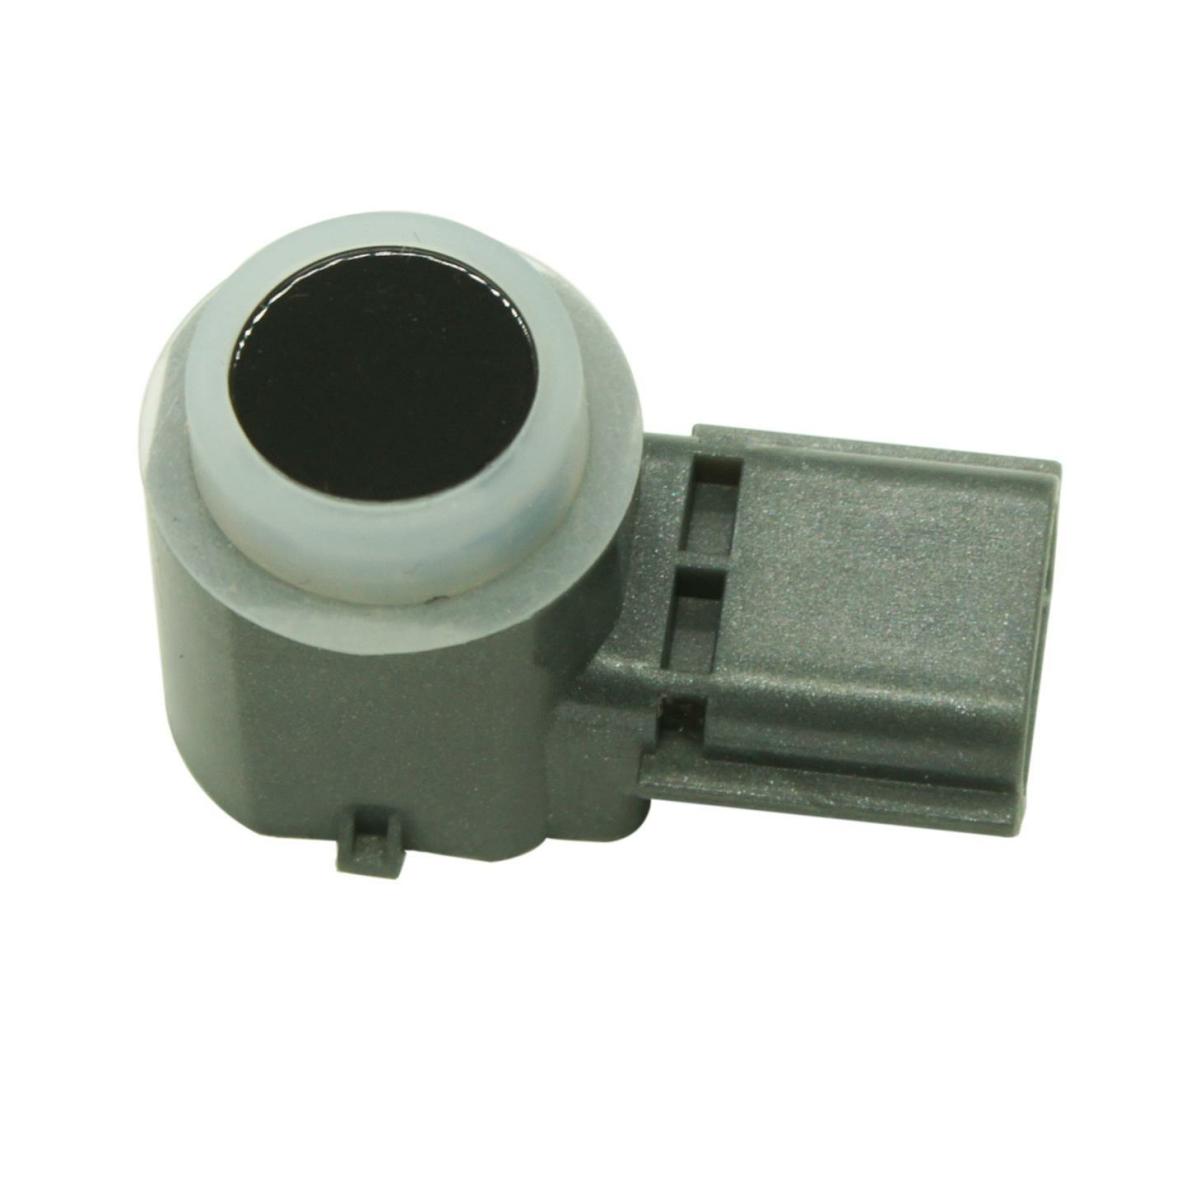 Parksensor 28438-4GA6C für Infiniti PDC Parktronic